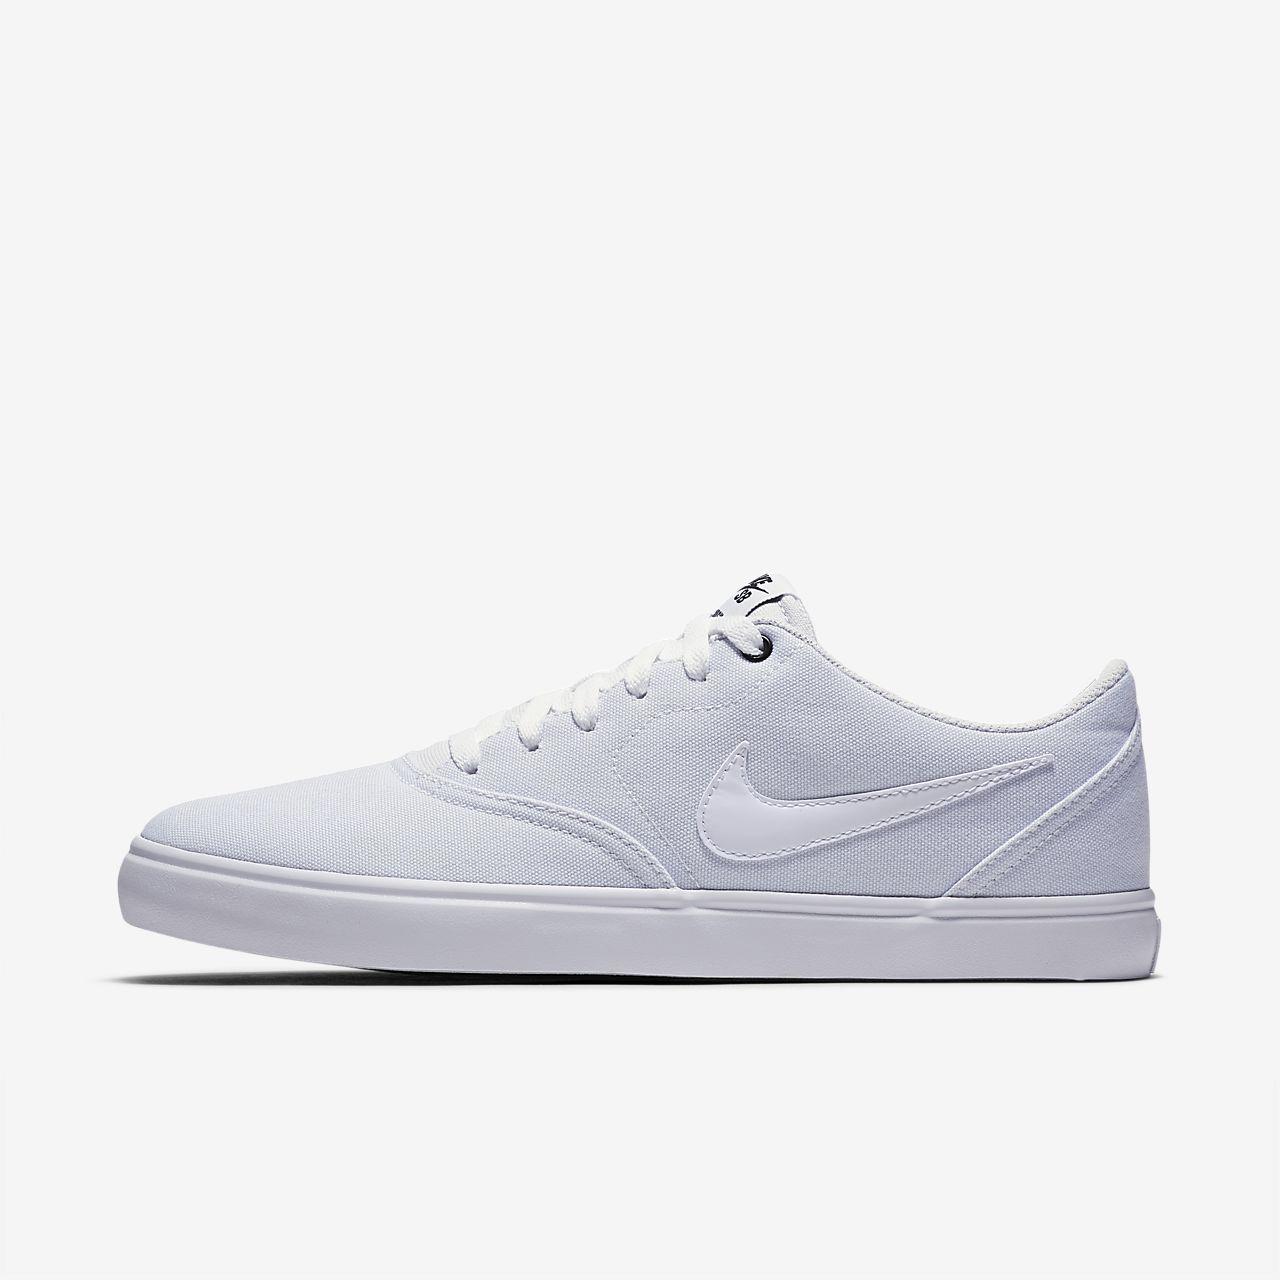 69fb3addab Ανδρικό παπούτσι skateboarding Nike SB Check Solarsoft Canvas. Nike ...